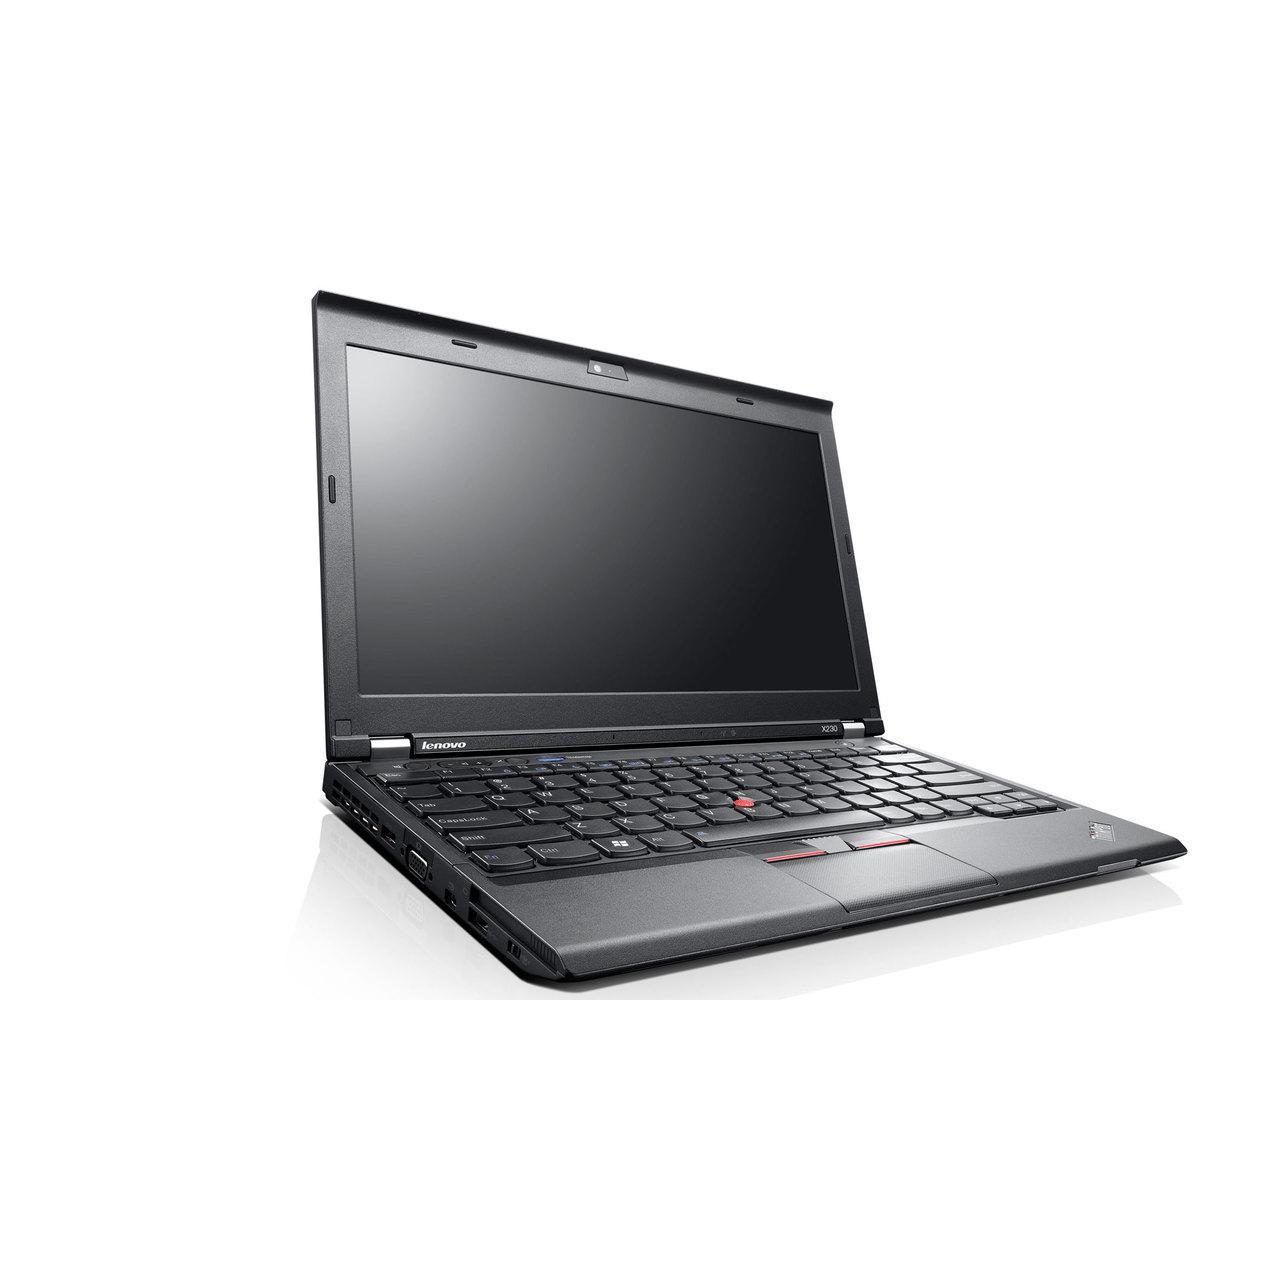 Lenovo Thinkpad X230 12-inch (2012) - Core i5-3320M - 4 GB  - HDD 500 GB